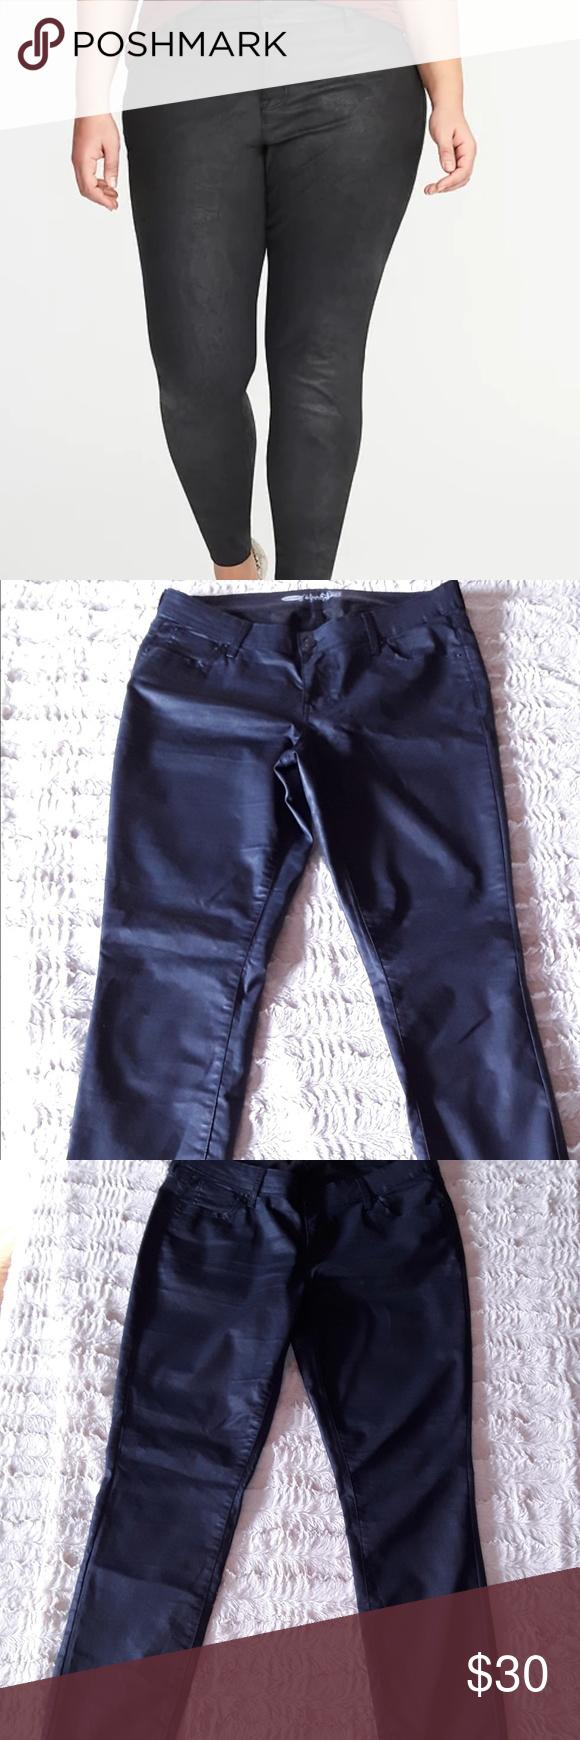 Old Navy Coated Rocksar Navy Blue Jean Size 14 Pre Owned Old Navy Coated Navy Blue Jeans Is In Excellent Con Old Navy Coats Perfect Jeans Blue Jeans